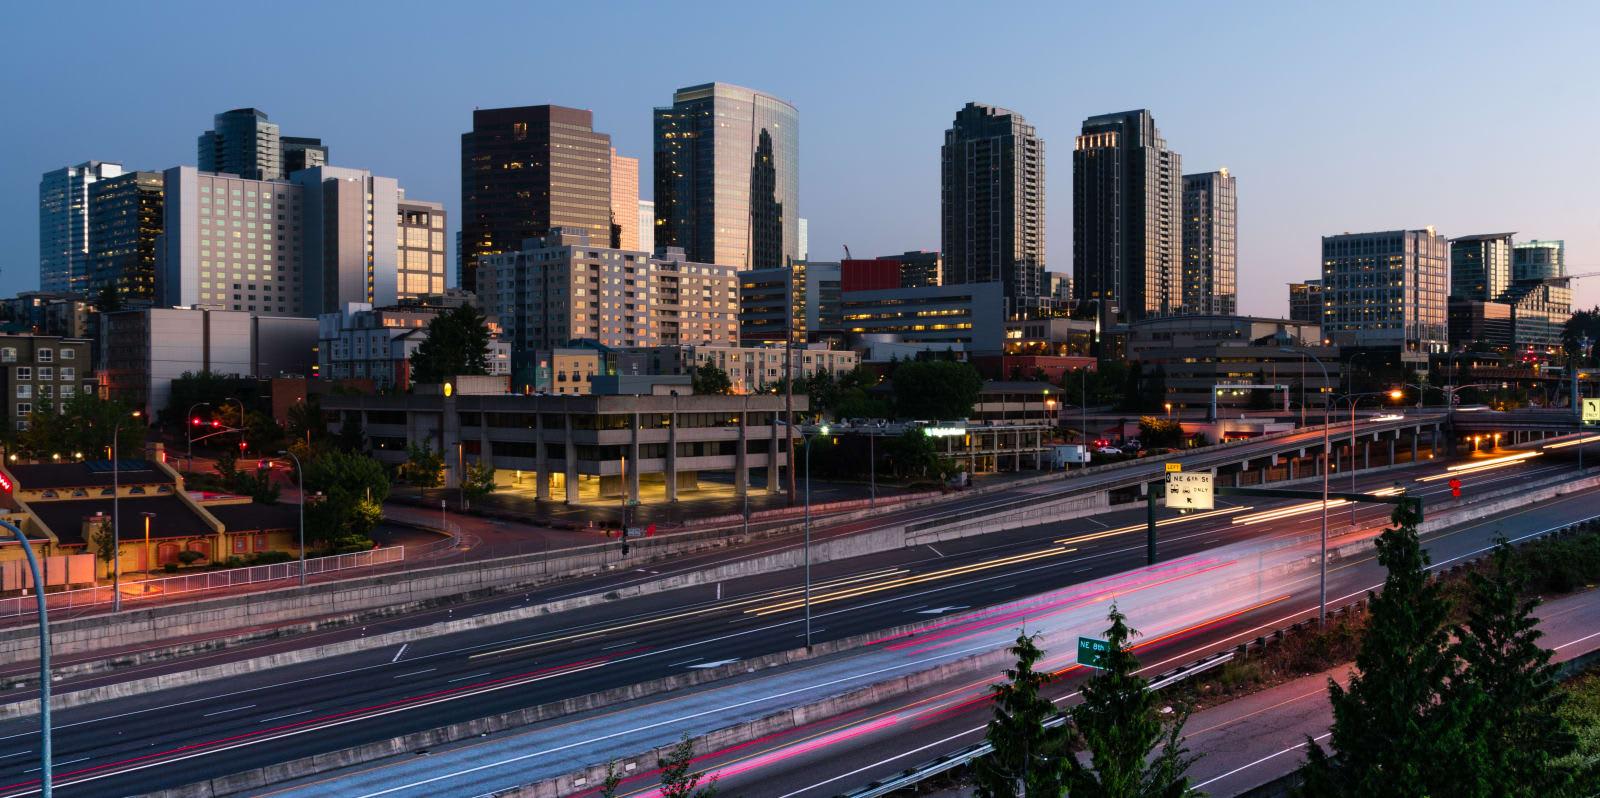 Amazon plans to build its tallest skyscraper in Bellevue, WA